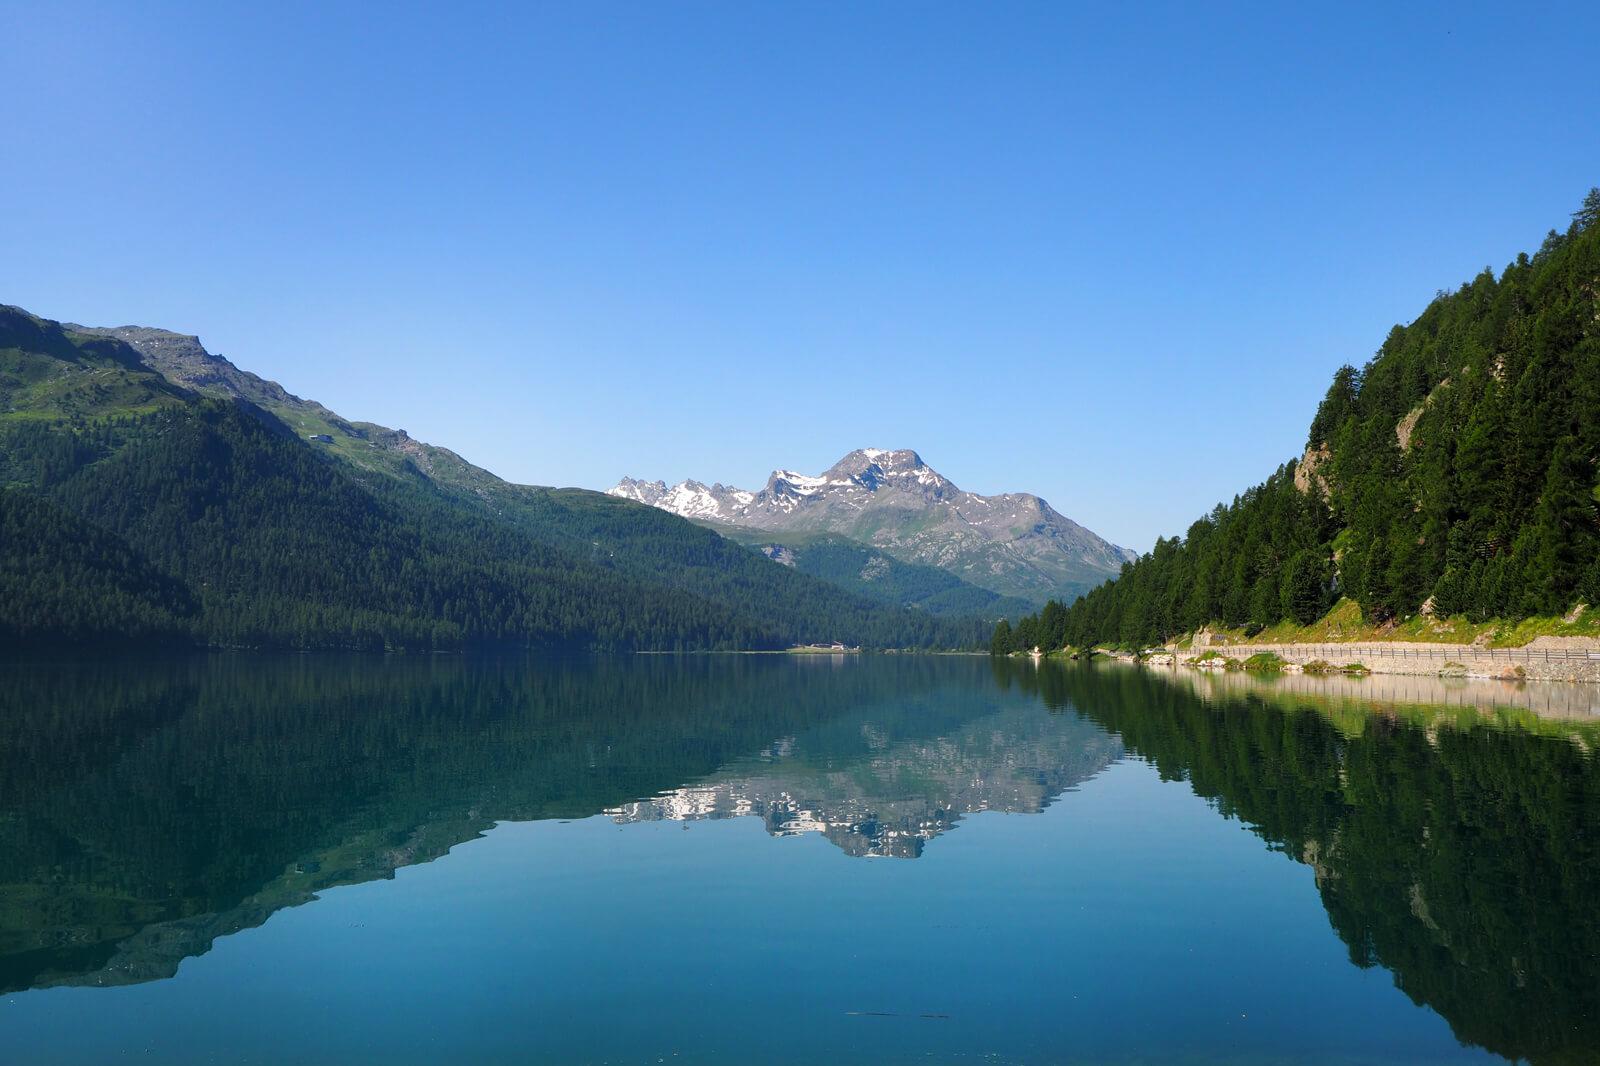 Lake Silvaplana in July 2020